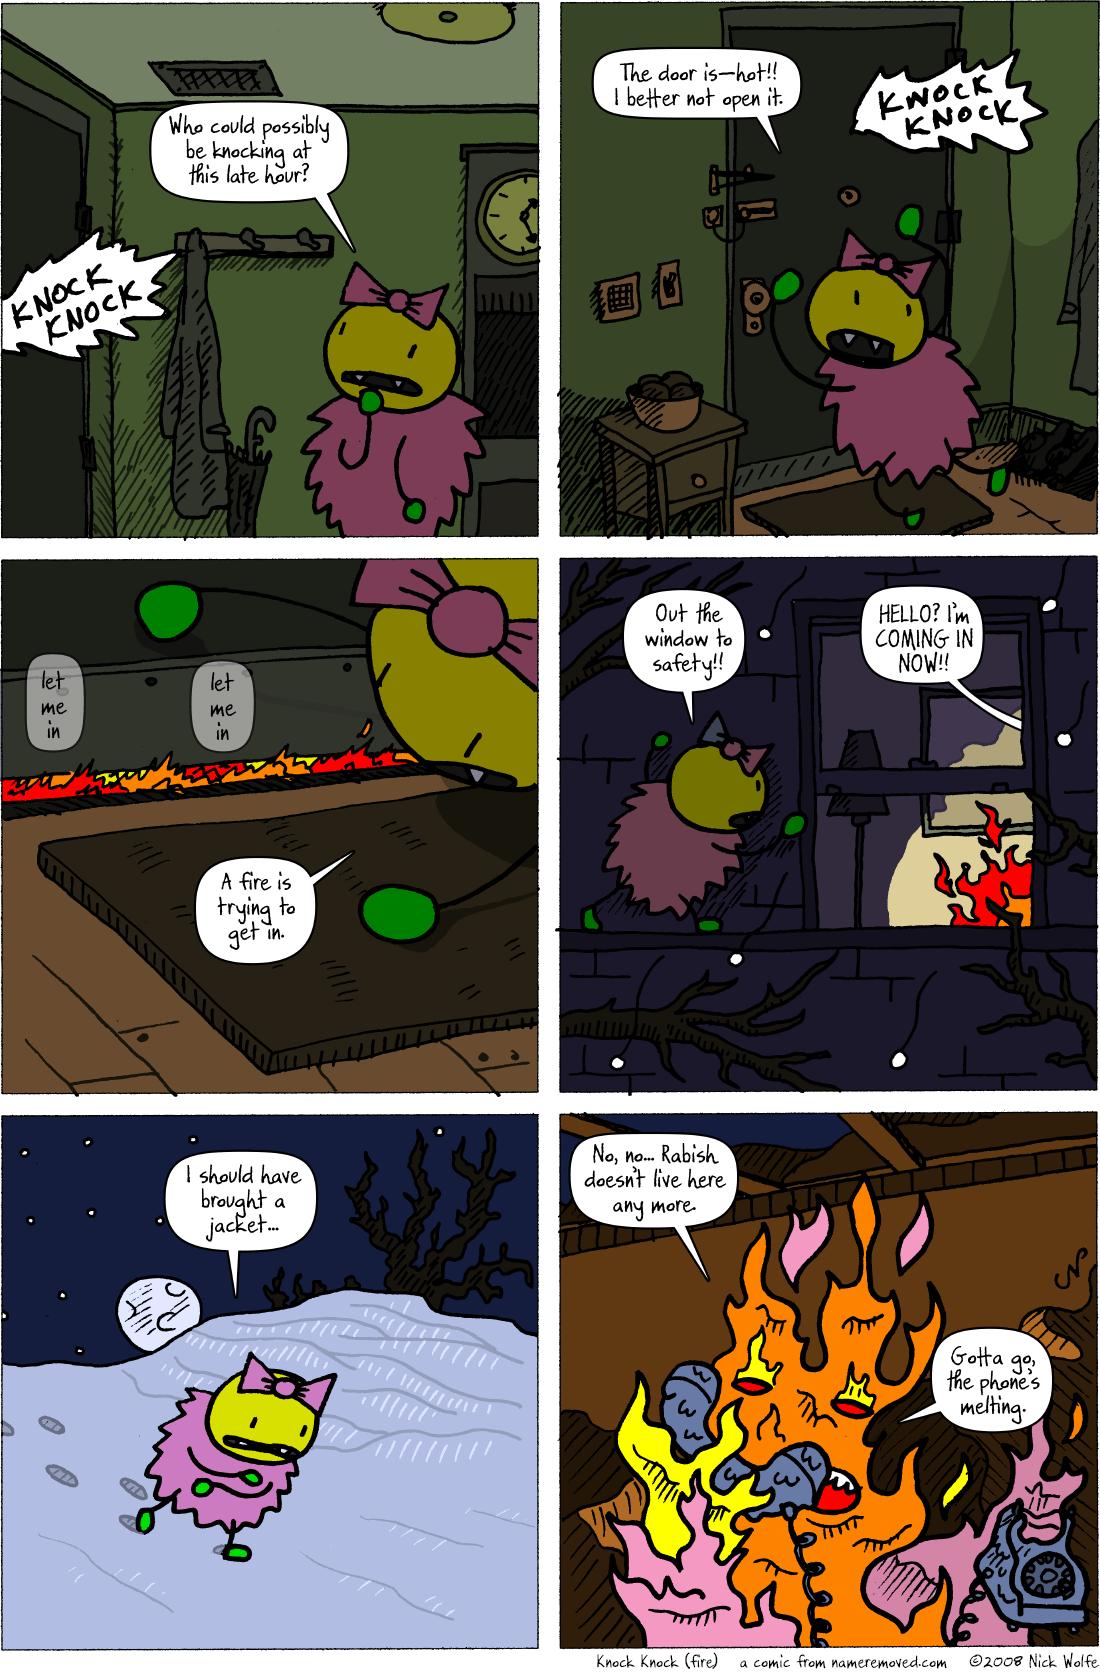 Knock Knock (fire)